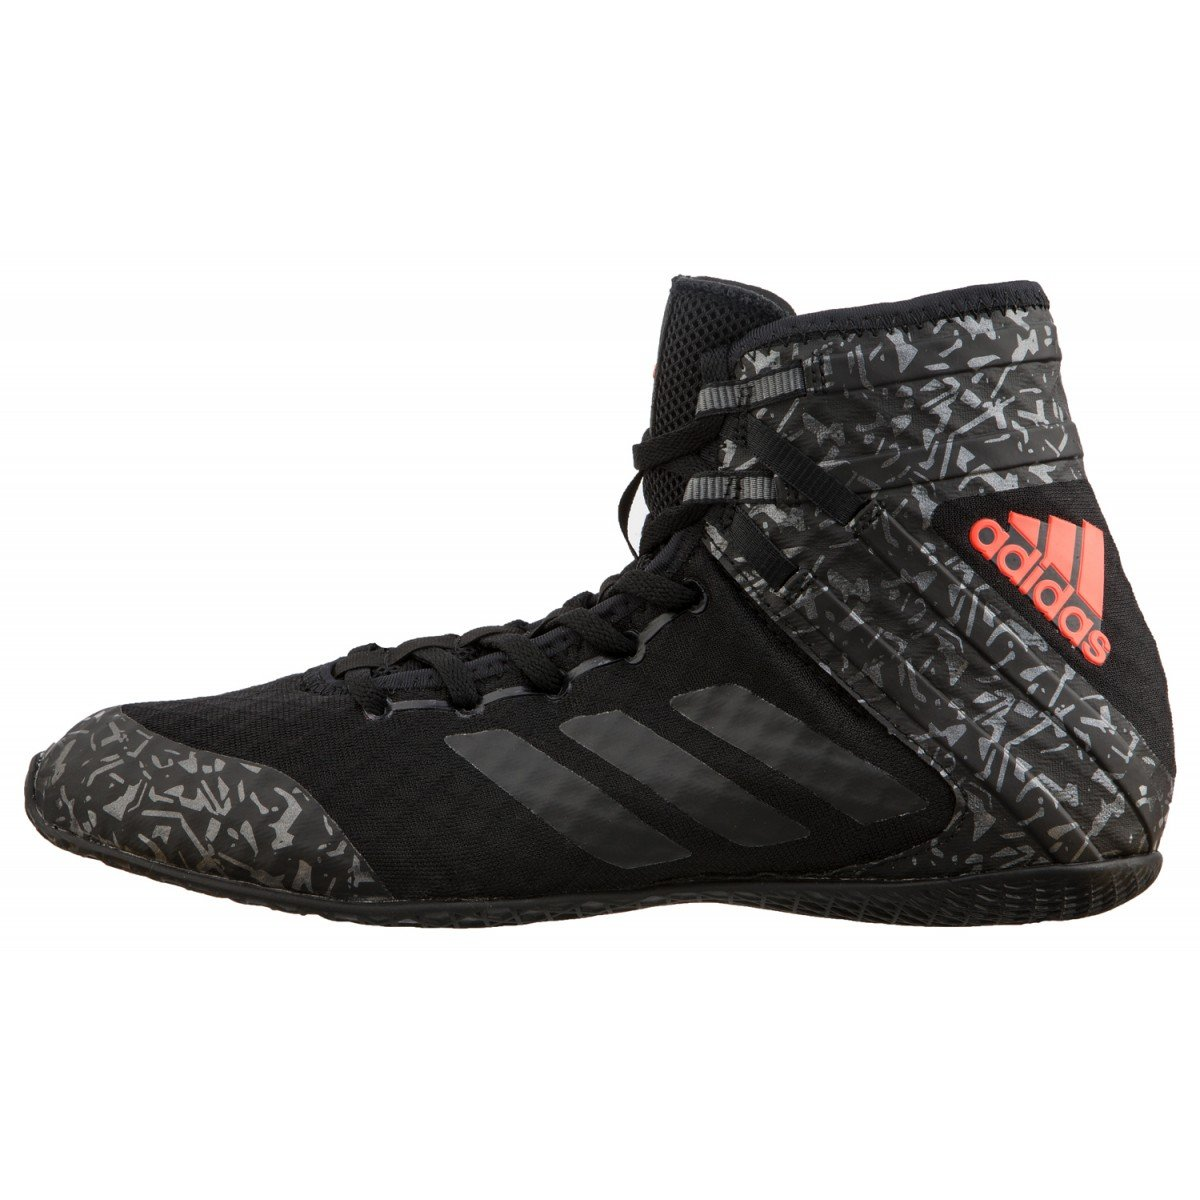 adidas wrestling boxing shoes